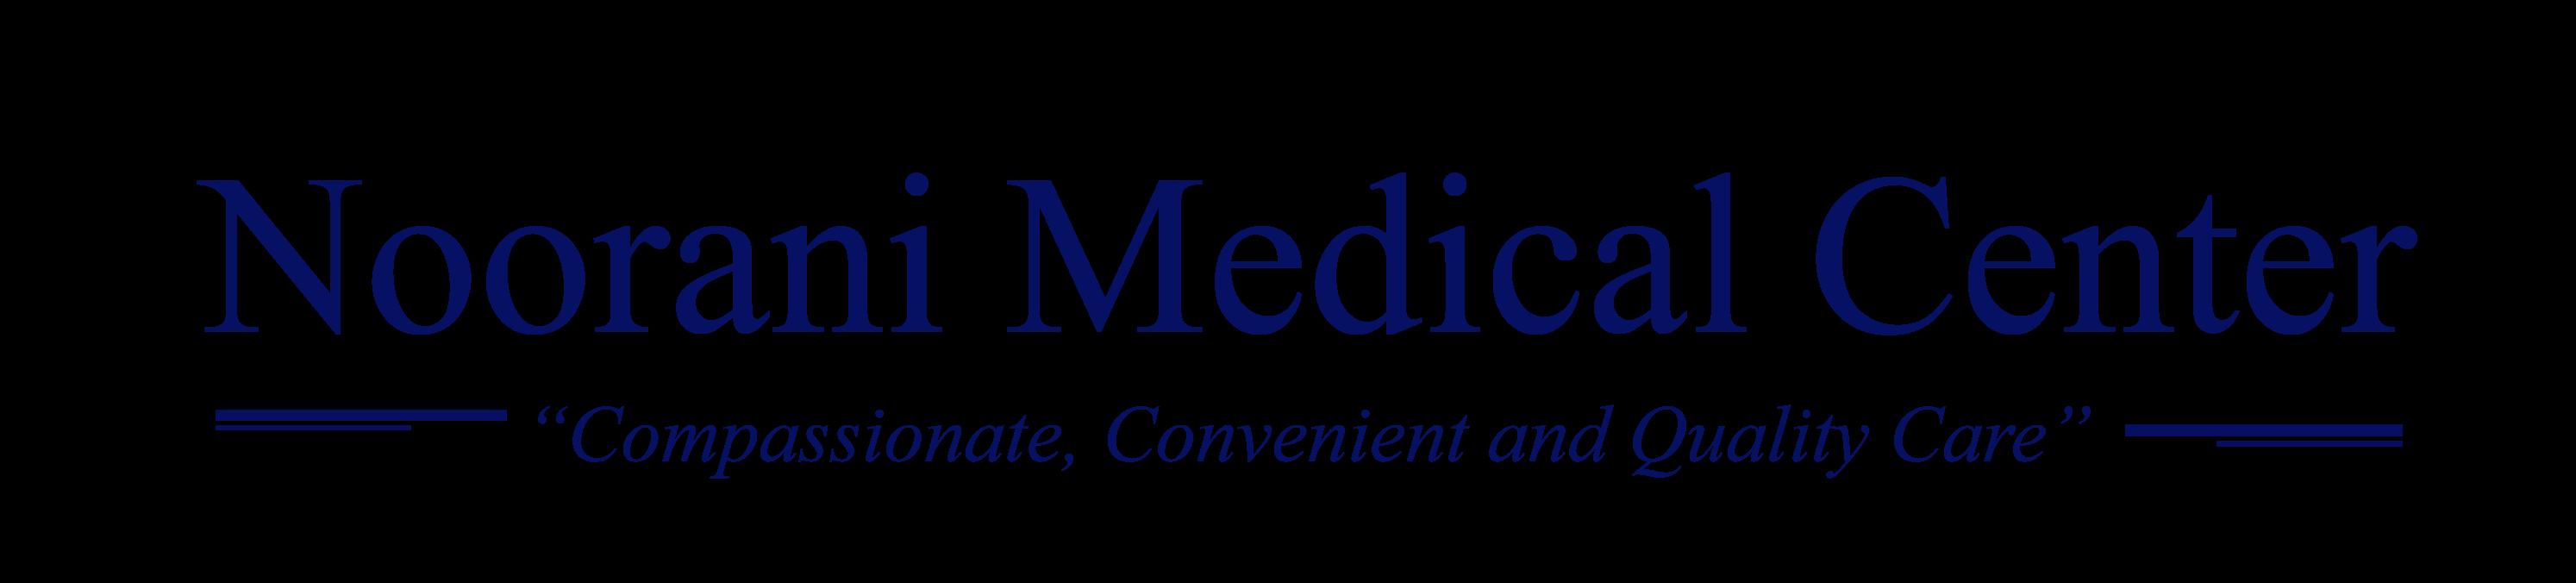 Noorani Medical Center Logo